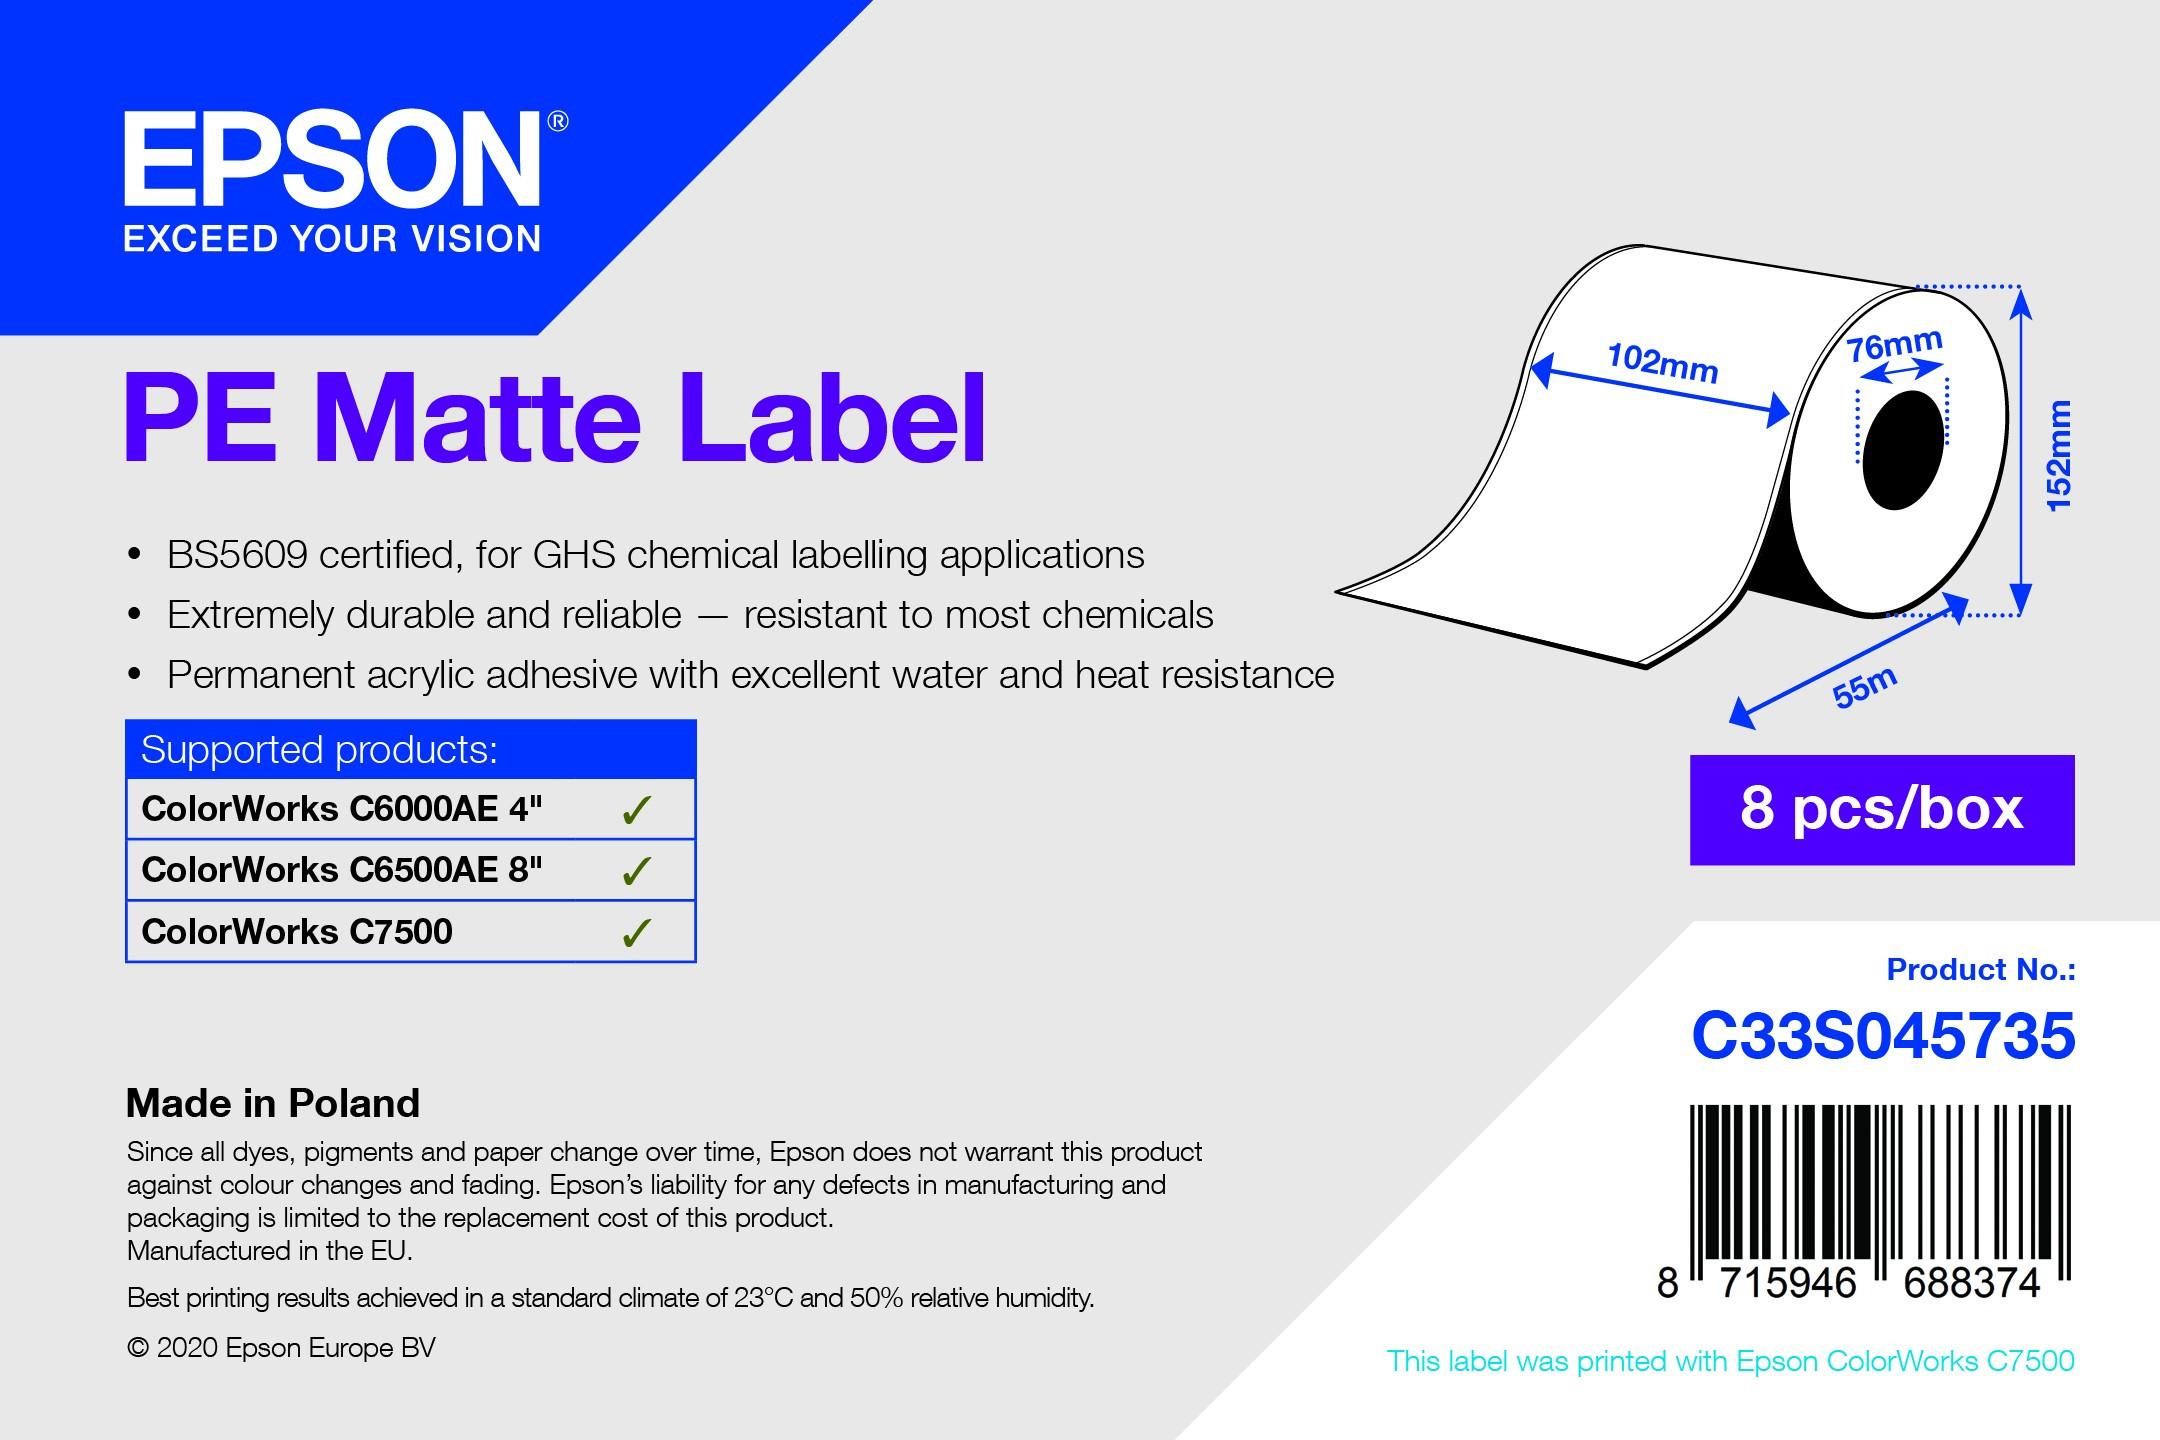 Epson 102mm X 55m matt címke